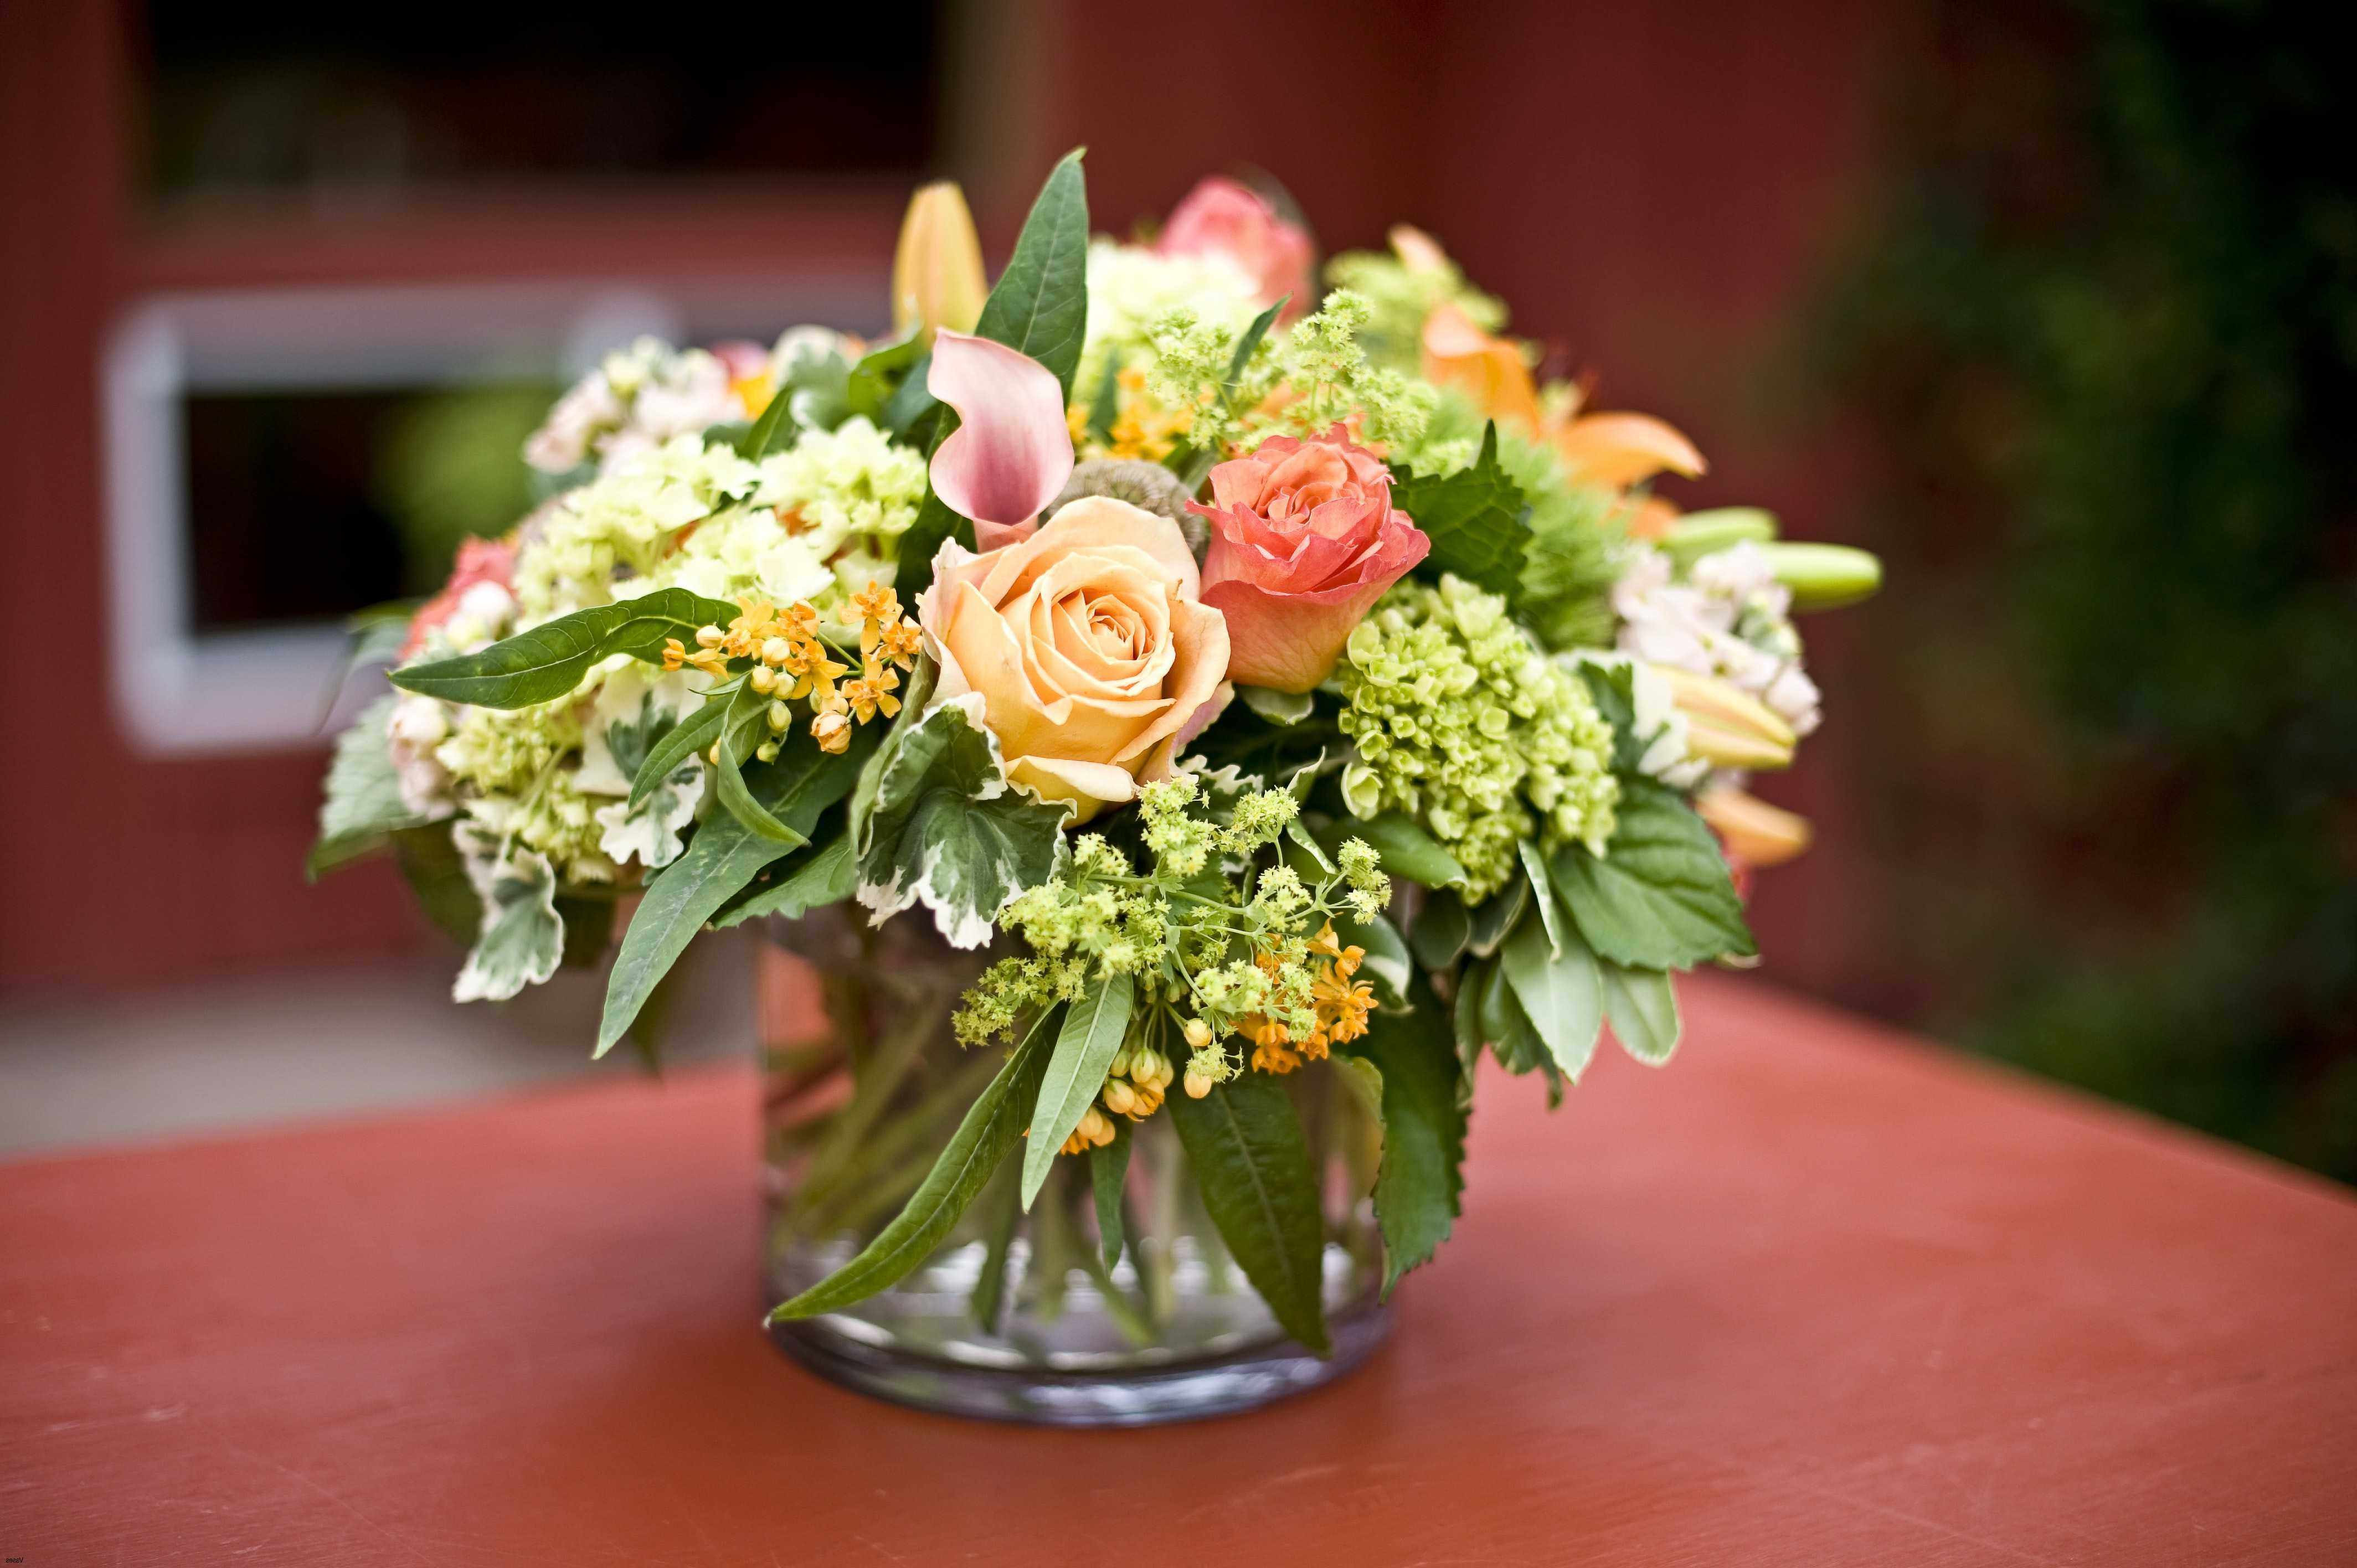 Galery of 60 Best Send someone Flowers